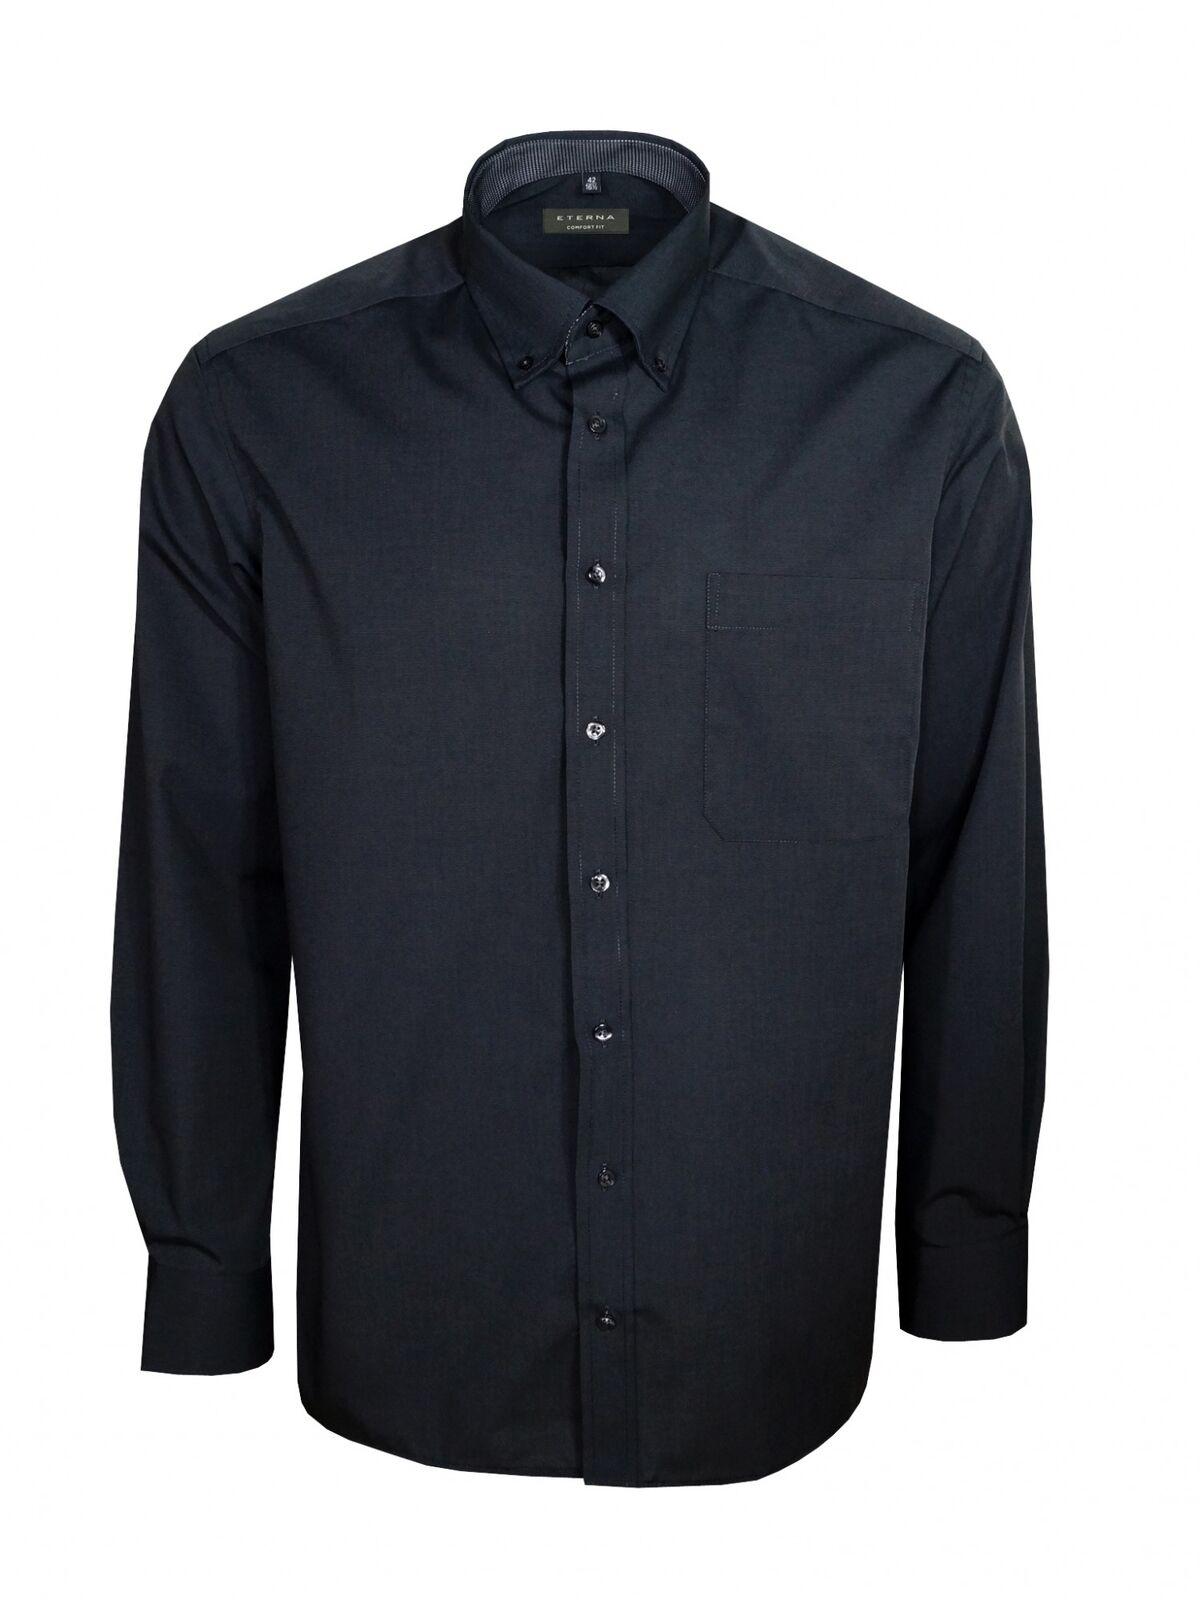 Eterna Herren Hemd Langarm Comfort Fit Business Hemden 3070 38 E144 Grau L 42